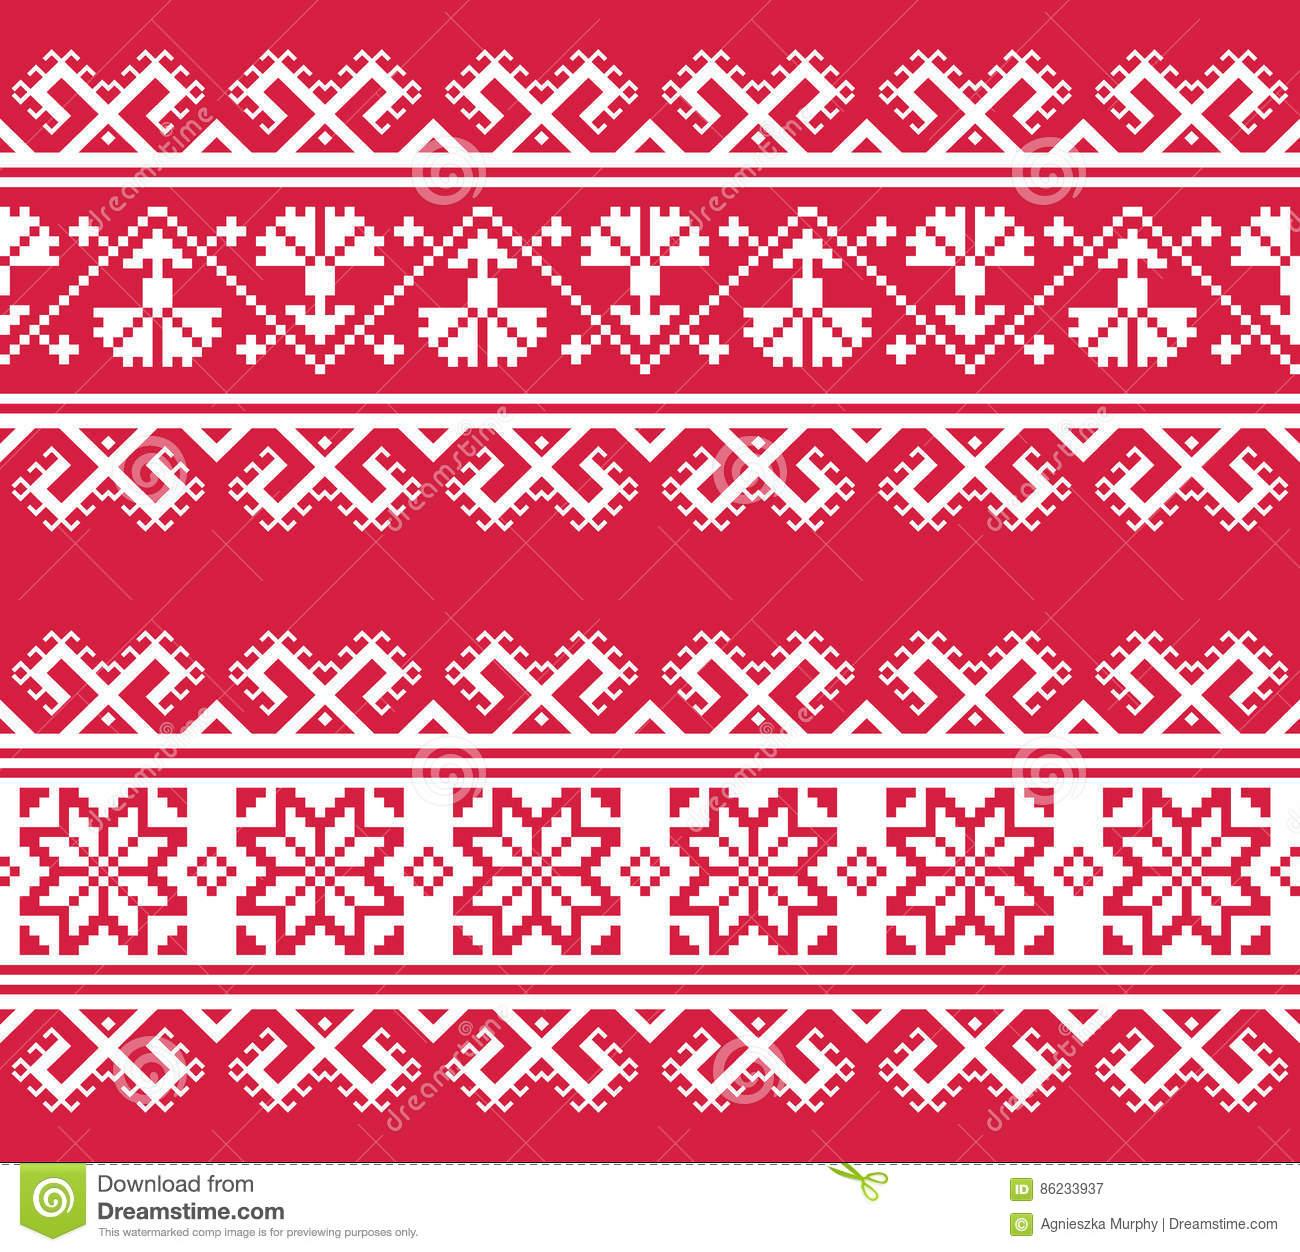 ukrainian-belarusian-folk-art-embroidery-pattern-red-white-slavic-traditional-design-ukraine-belarus-86233937